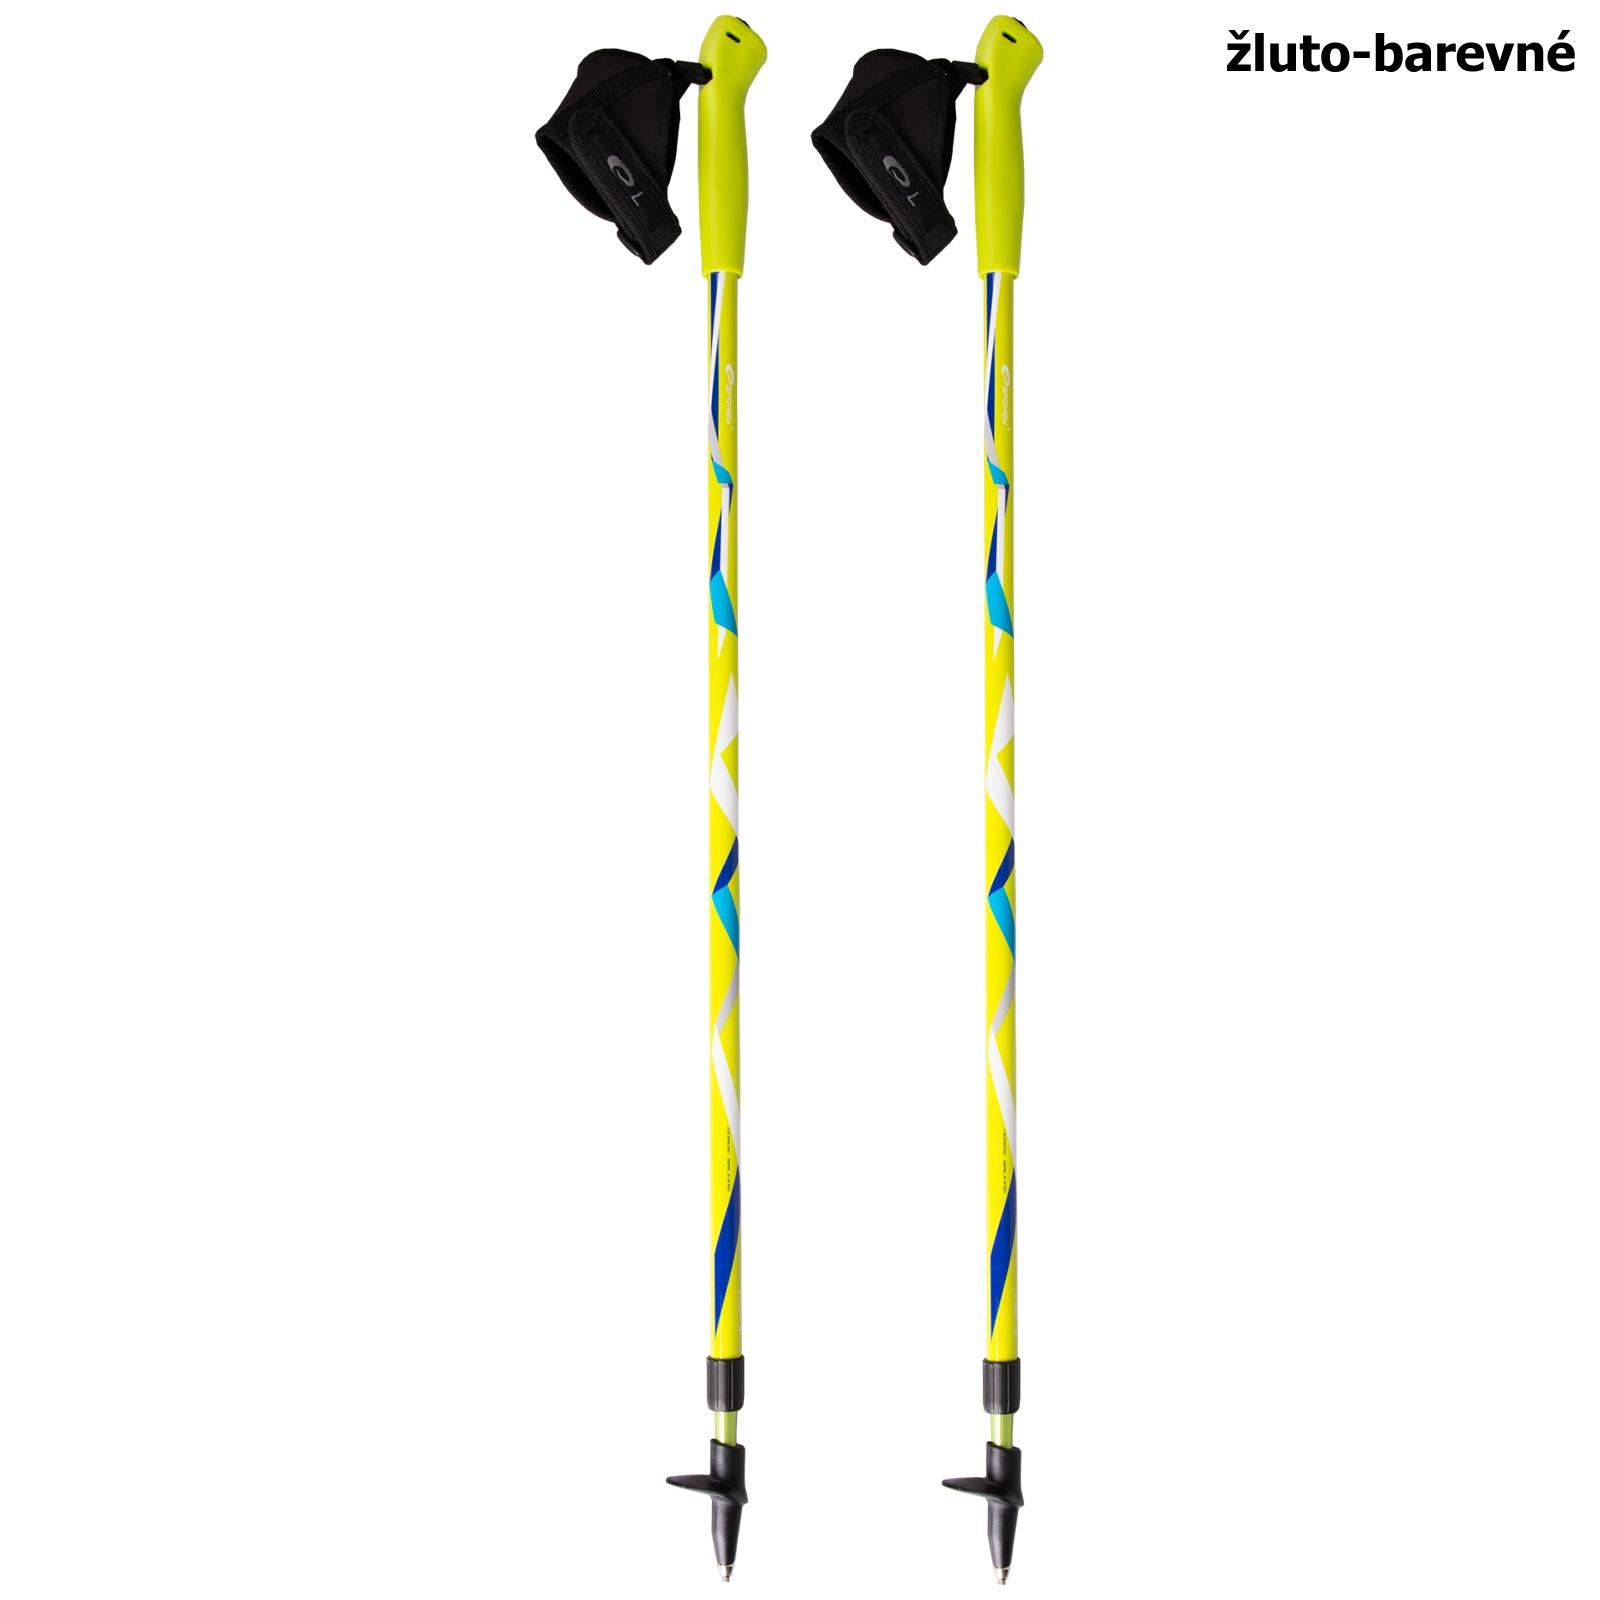 Trekingové hole SPOKEY Zigzag Nordic Walking - žluto-barevné